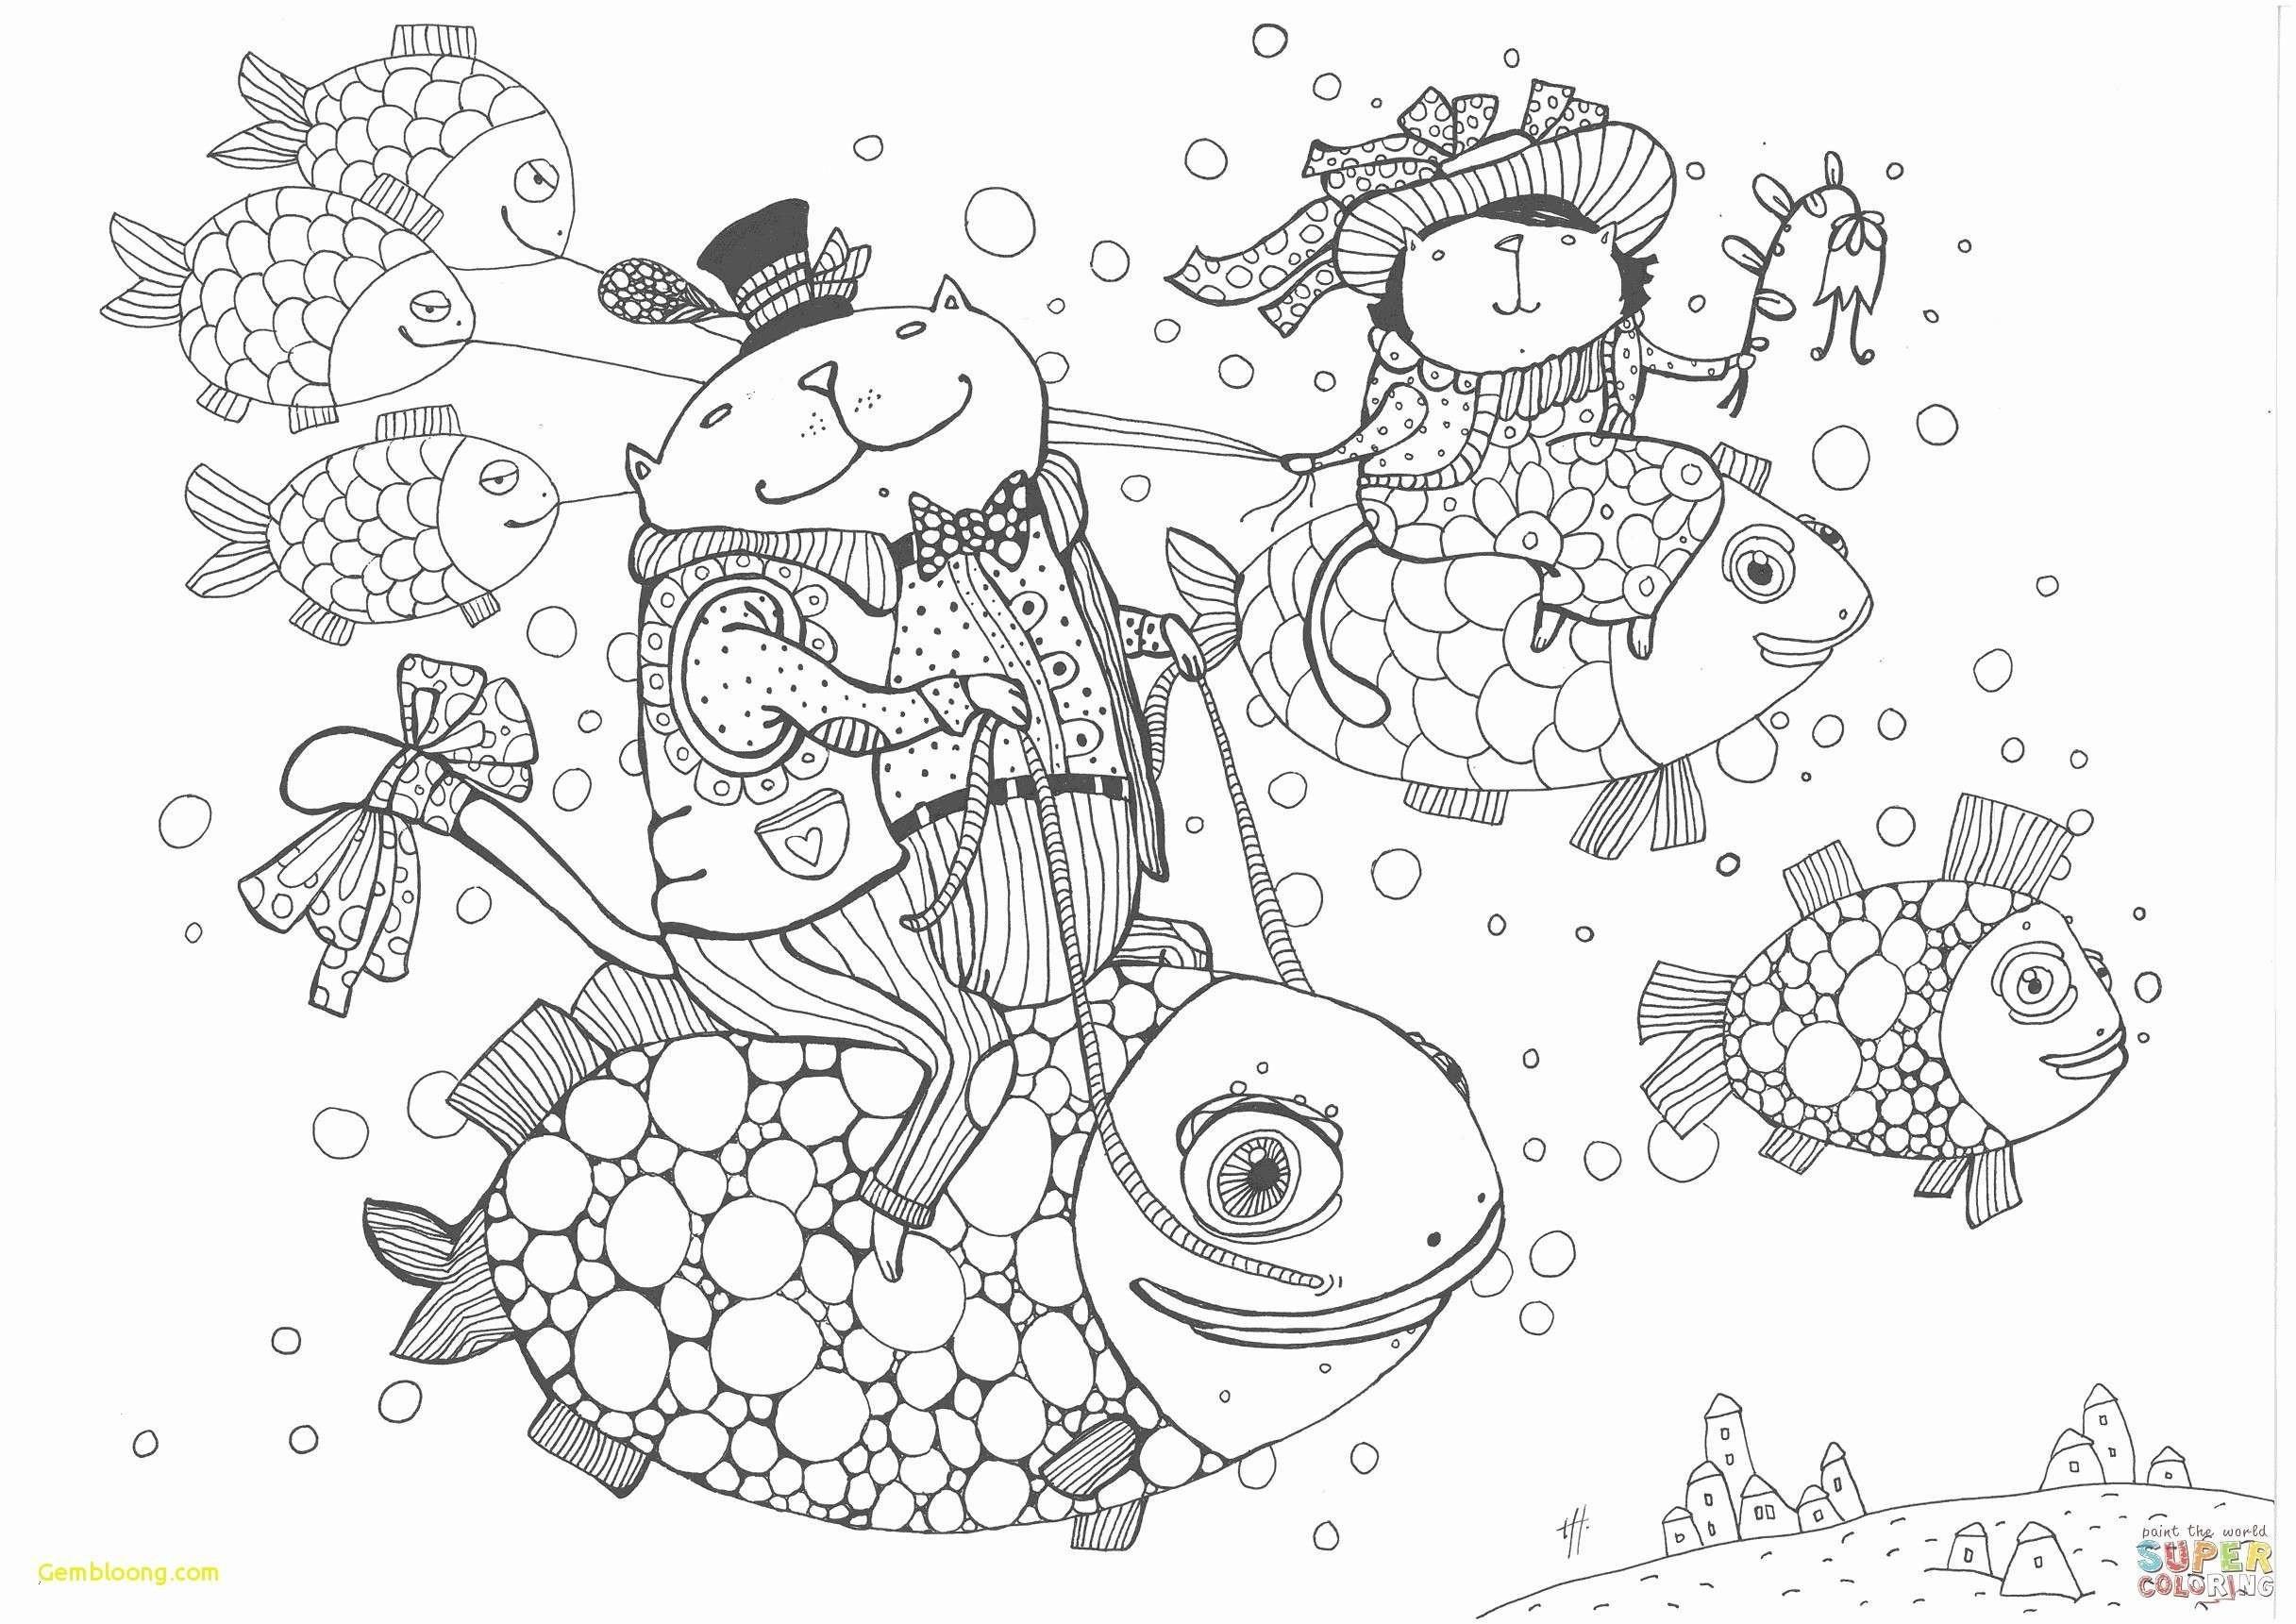 Emily Erdbeer Ausmalbilder Einzigartig 32 Ausmalbilder Herbst Mandala Scoredatscore Frisch Erdbeer Stock